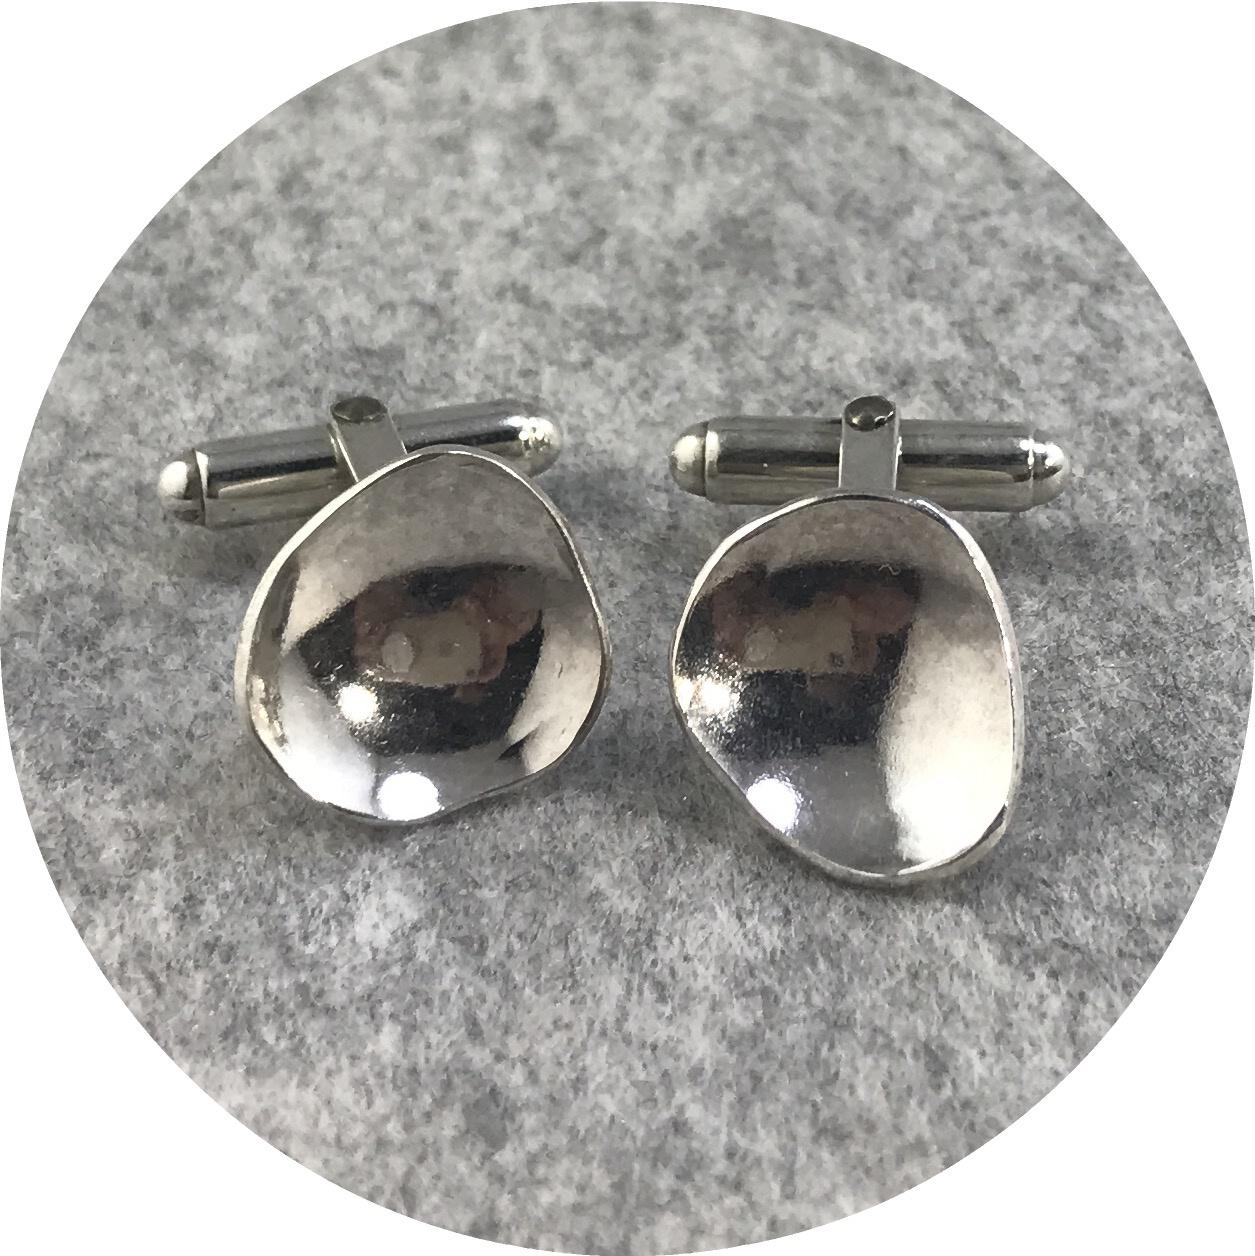 Elodie Darwish - Dish Cufflinks in Sterling Silver